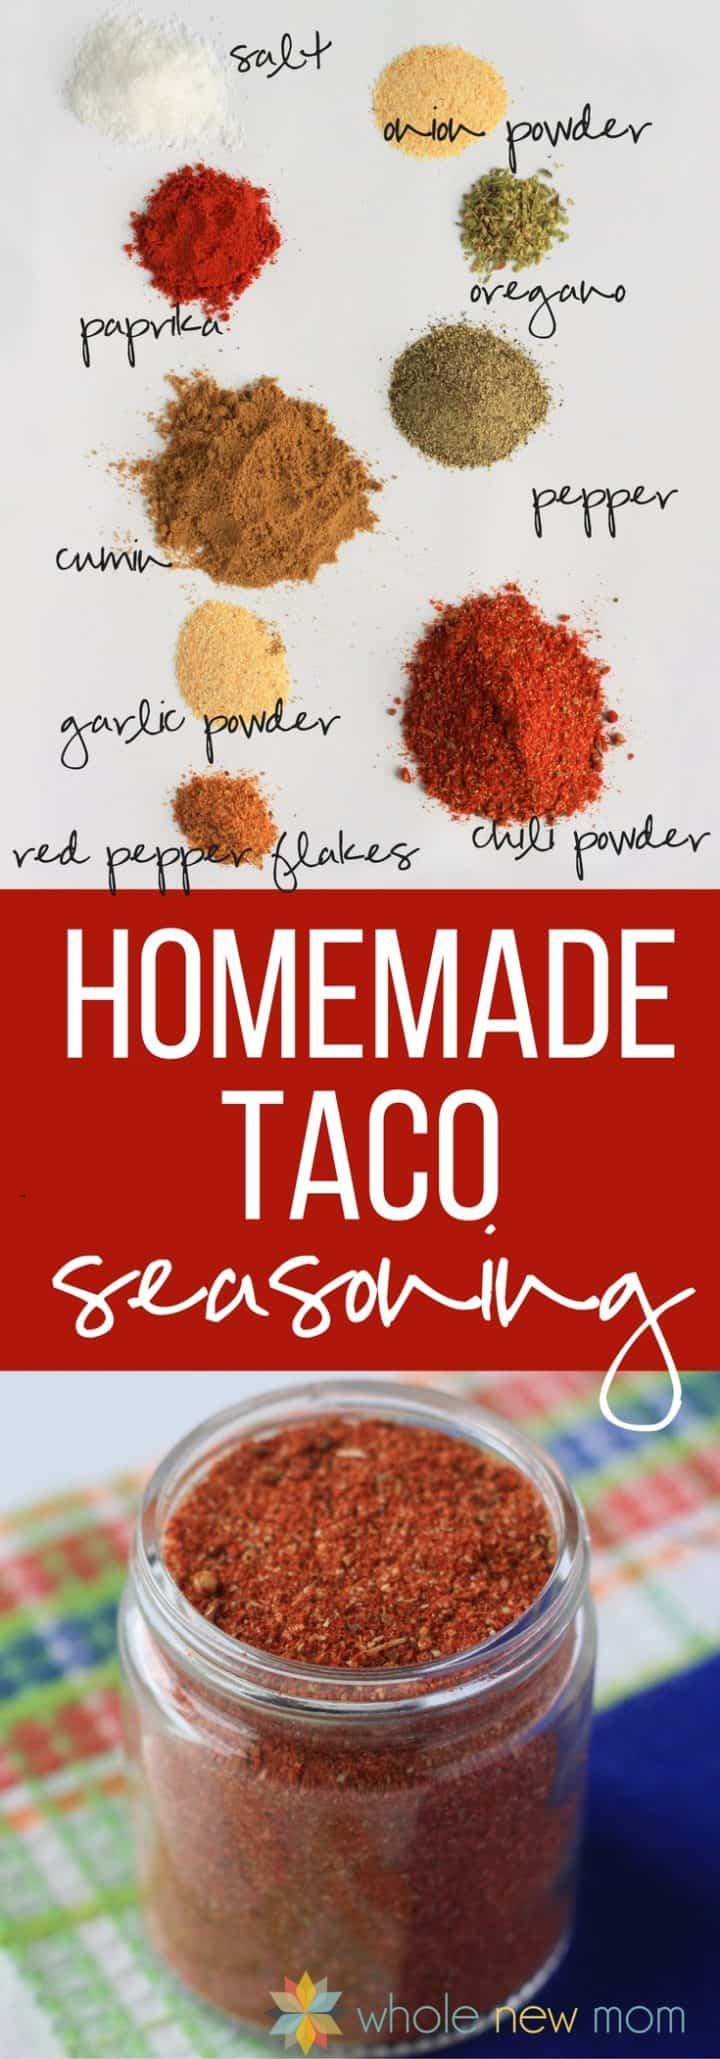 collage of homemade taco seasoning in a glass jar & taco seasoning ingredients